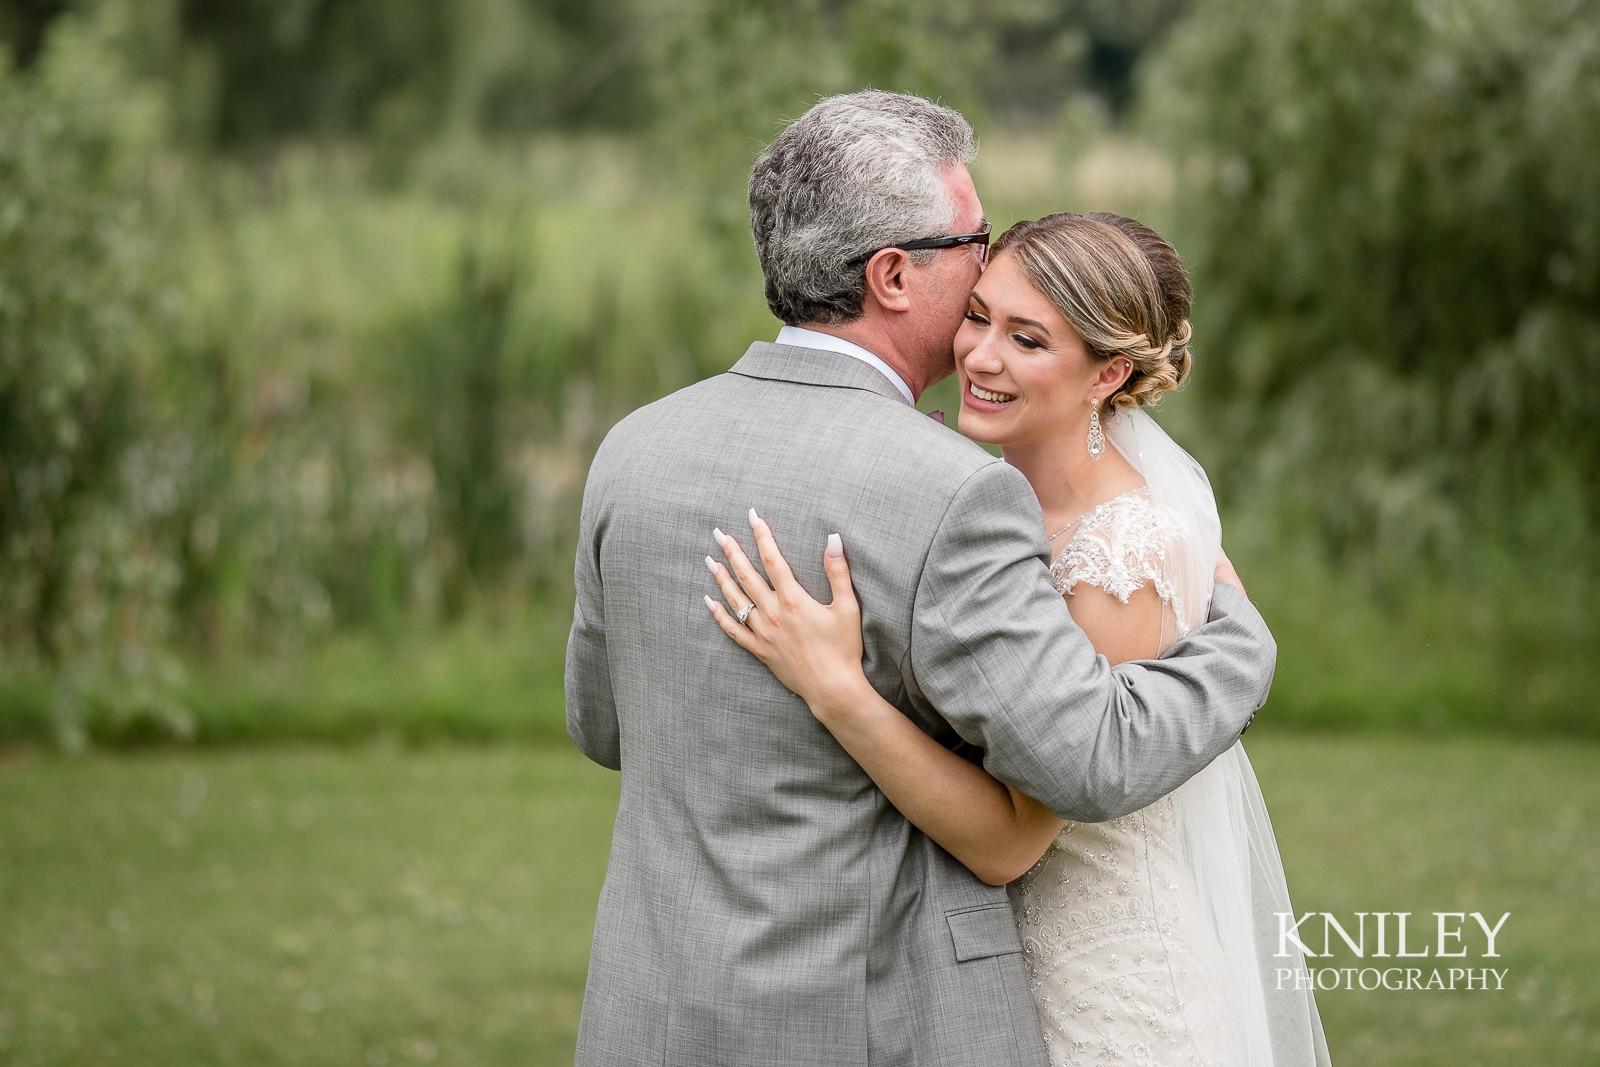 026 - Ontario Golf Club Wedding Pictures - XT2A6573.jpg